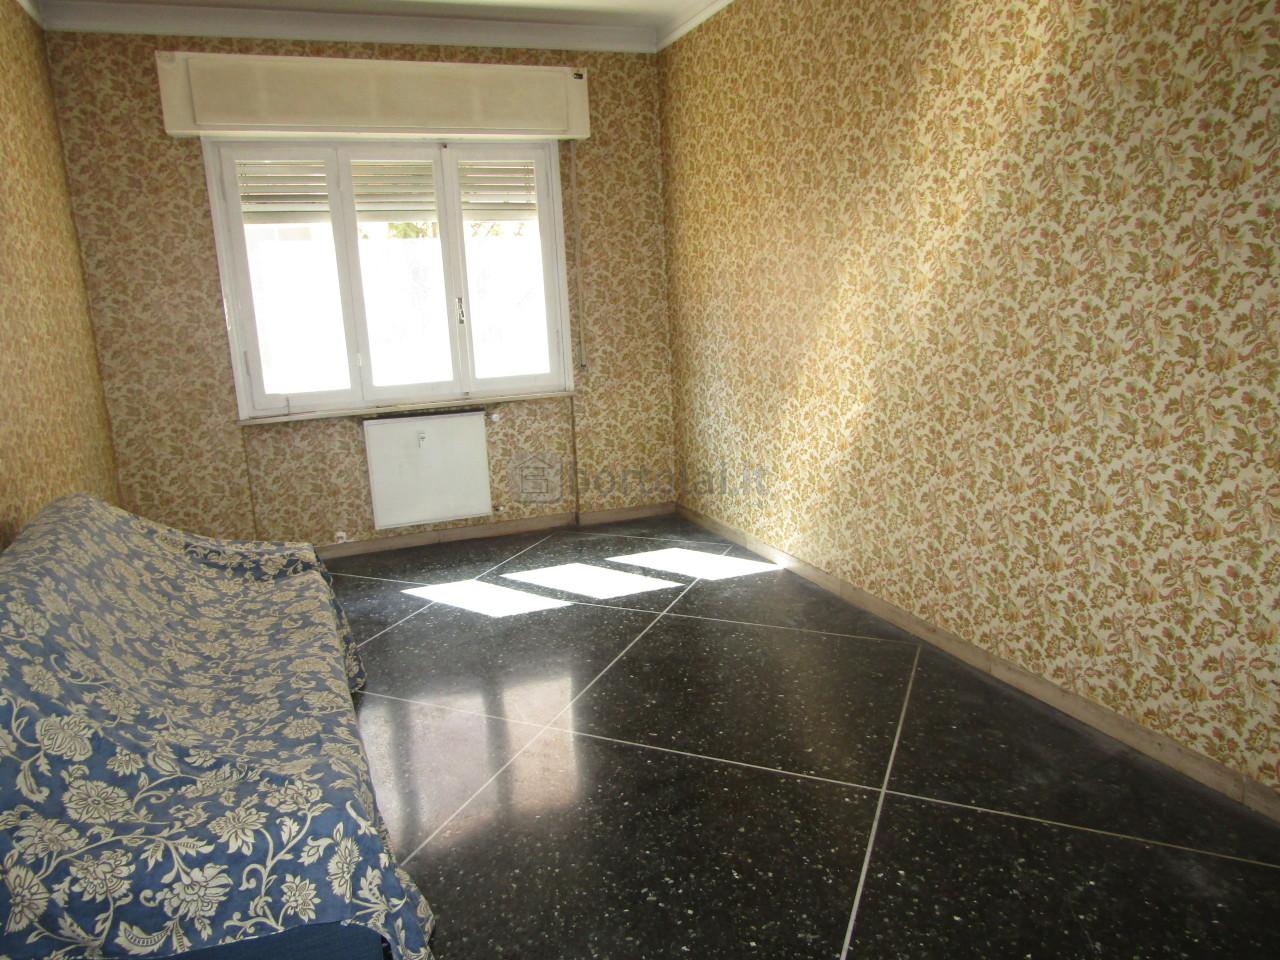 genova vendita quart: quarto immobiliare-bortolai.it-srl